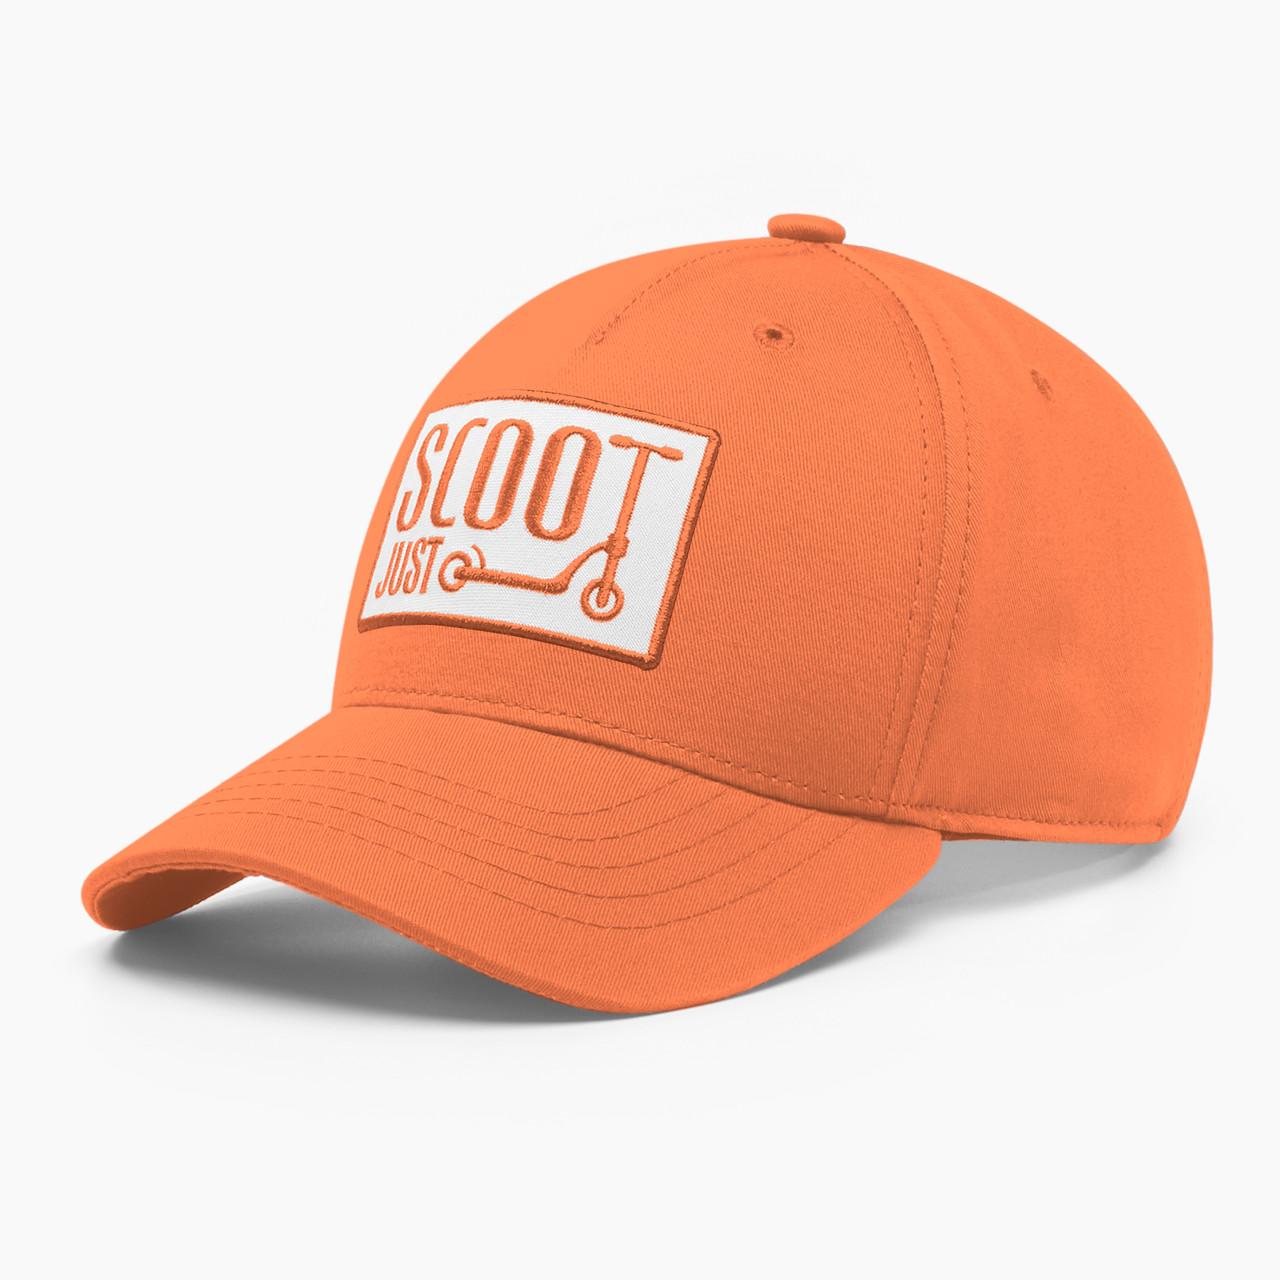 Кепка бейсболка INAL kick scooter S / 53-54 RU Оранжевый 232753